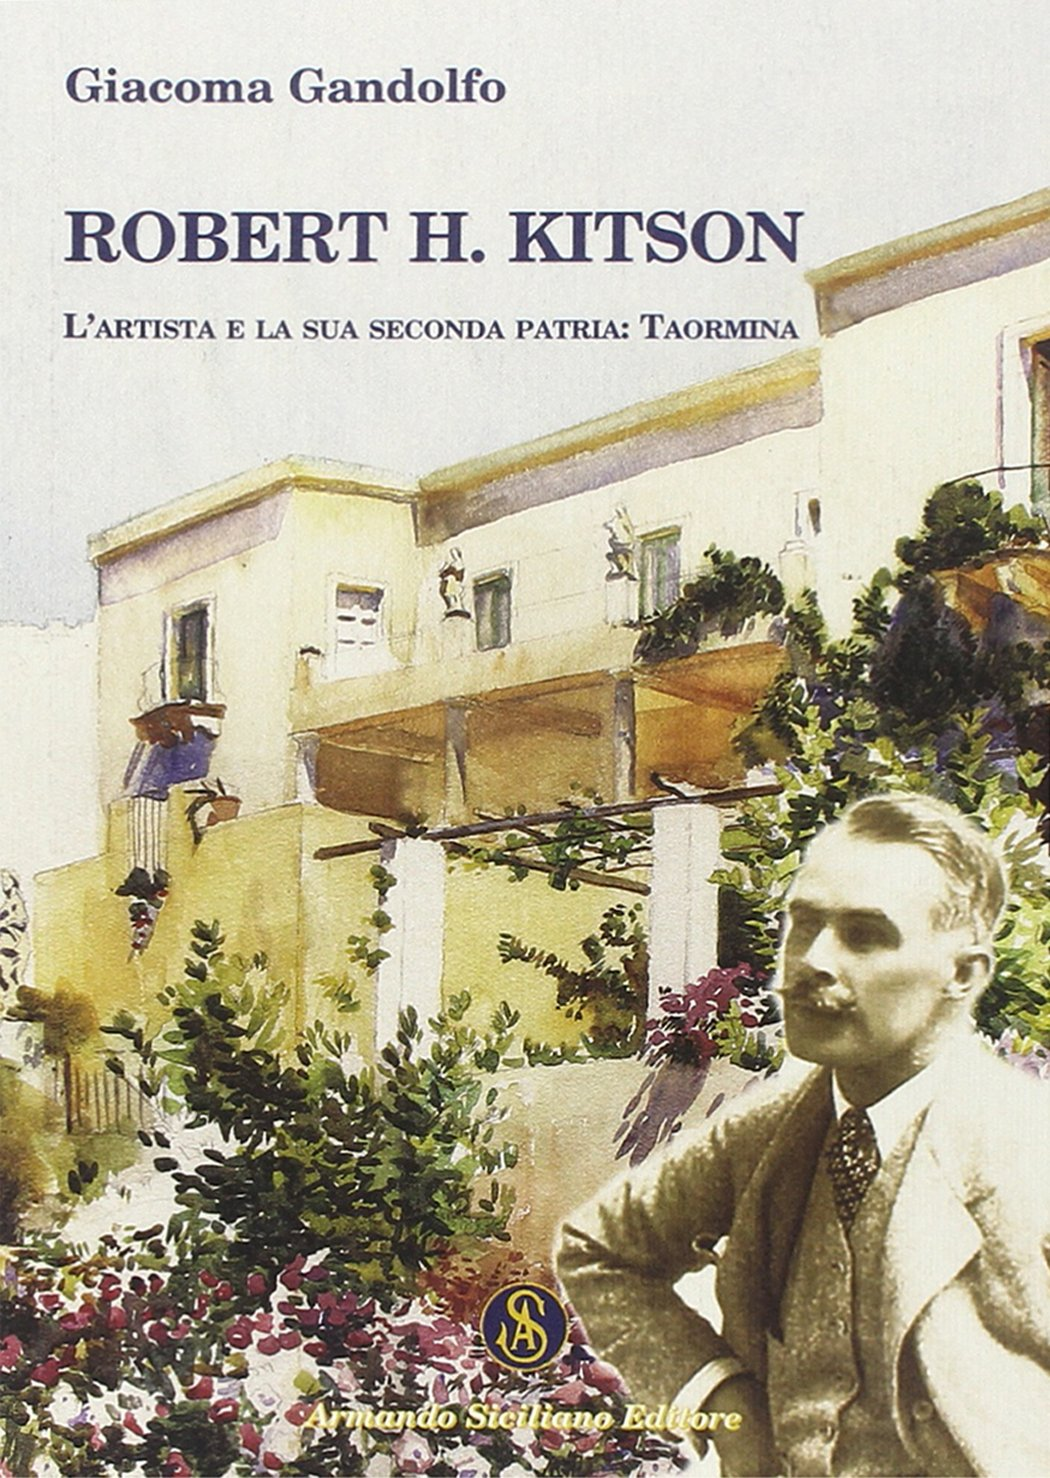 Robert H. Kitson